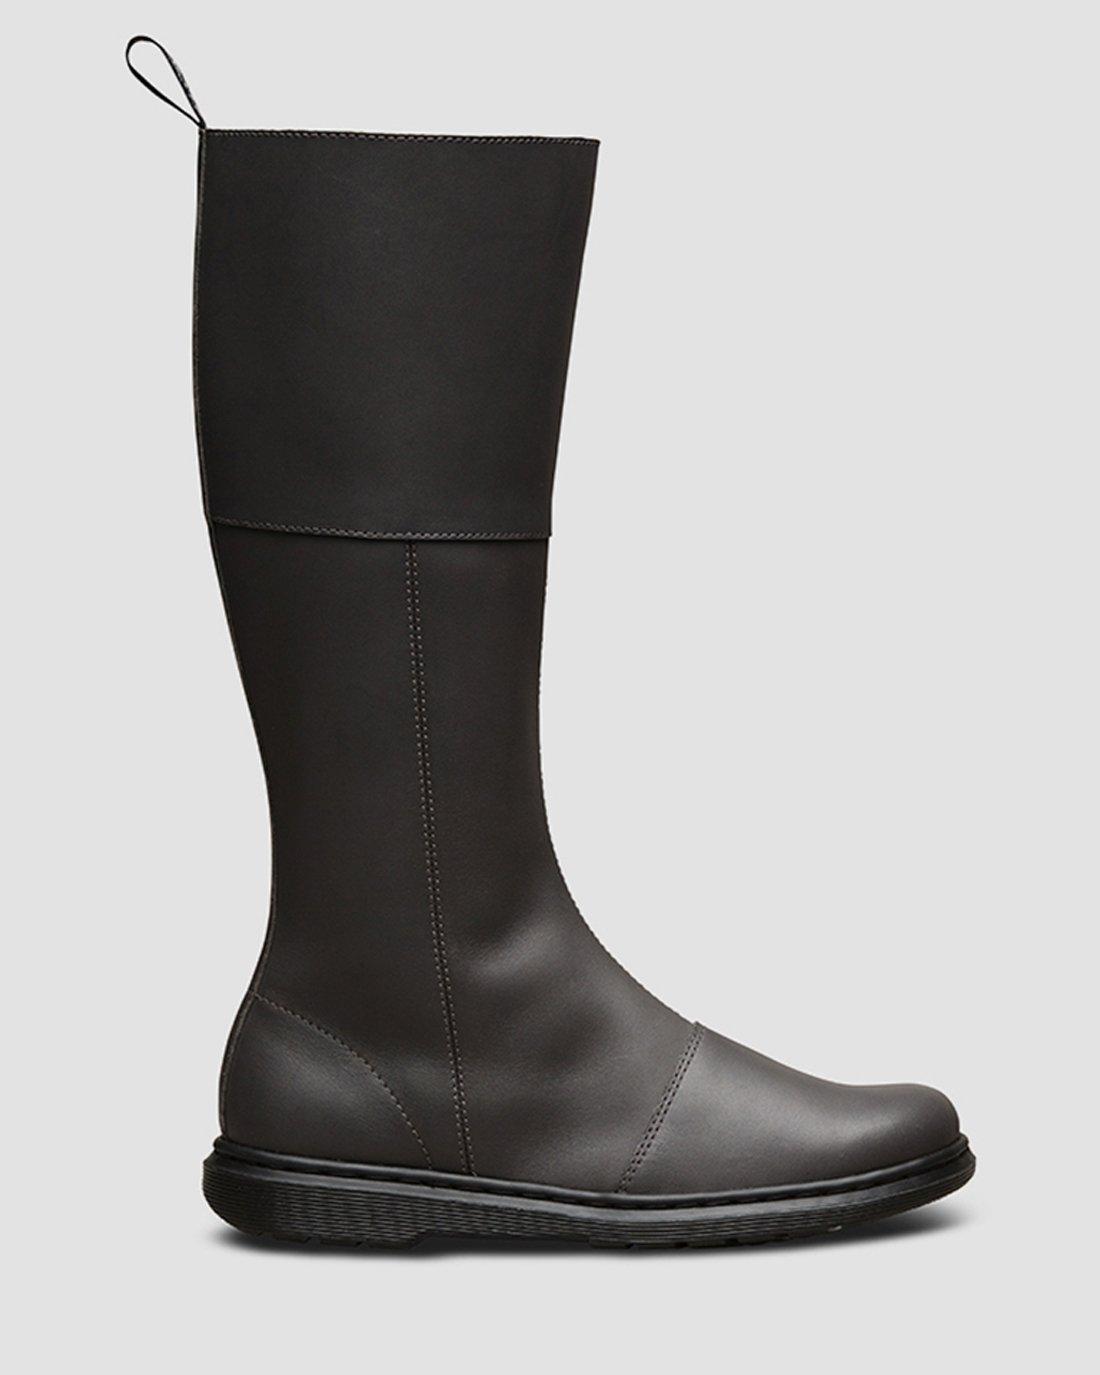 Buy Dr. Martens Women's's Lahiri High Boots, Grey Gunmetal